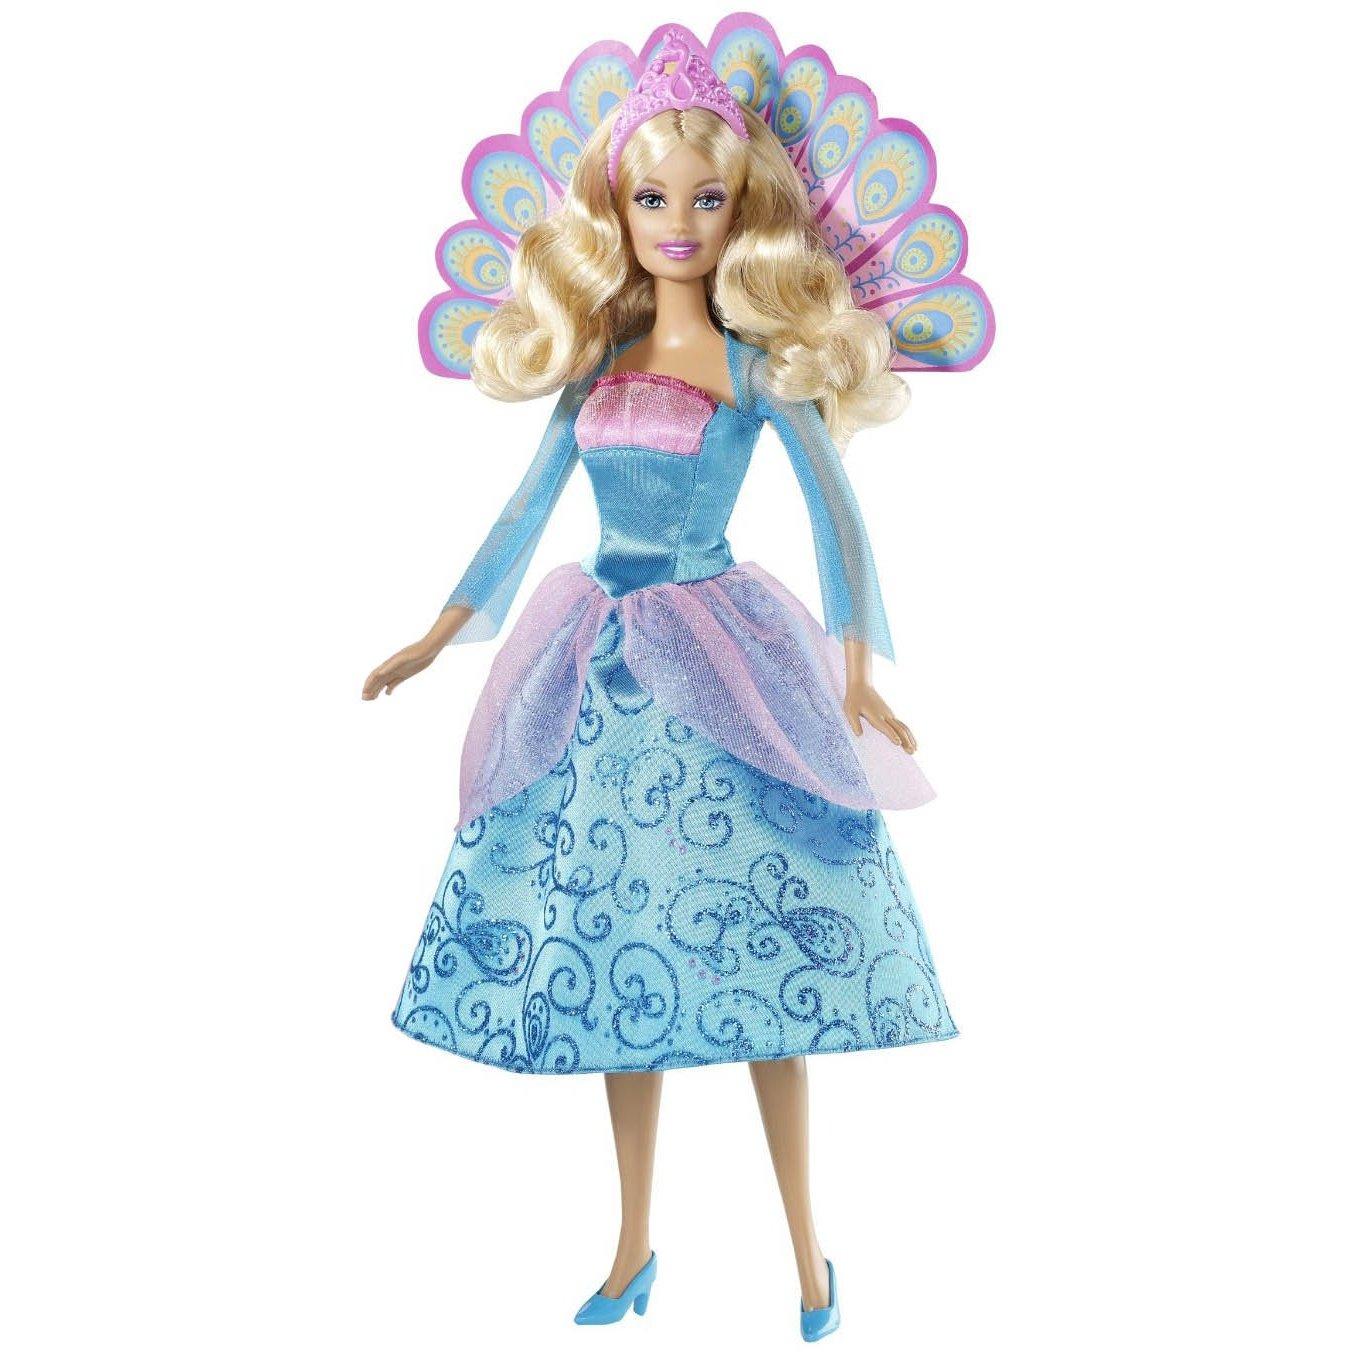 Rosella doll